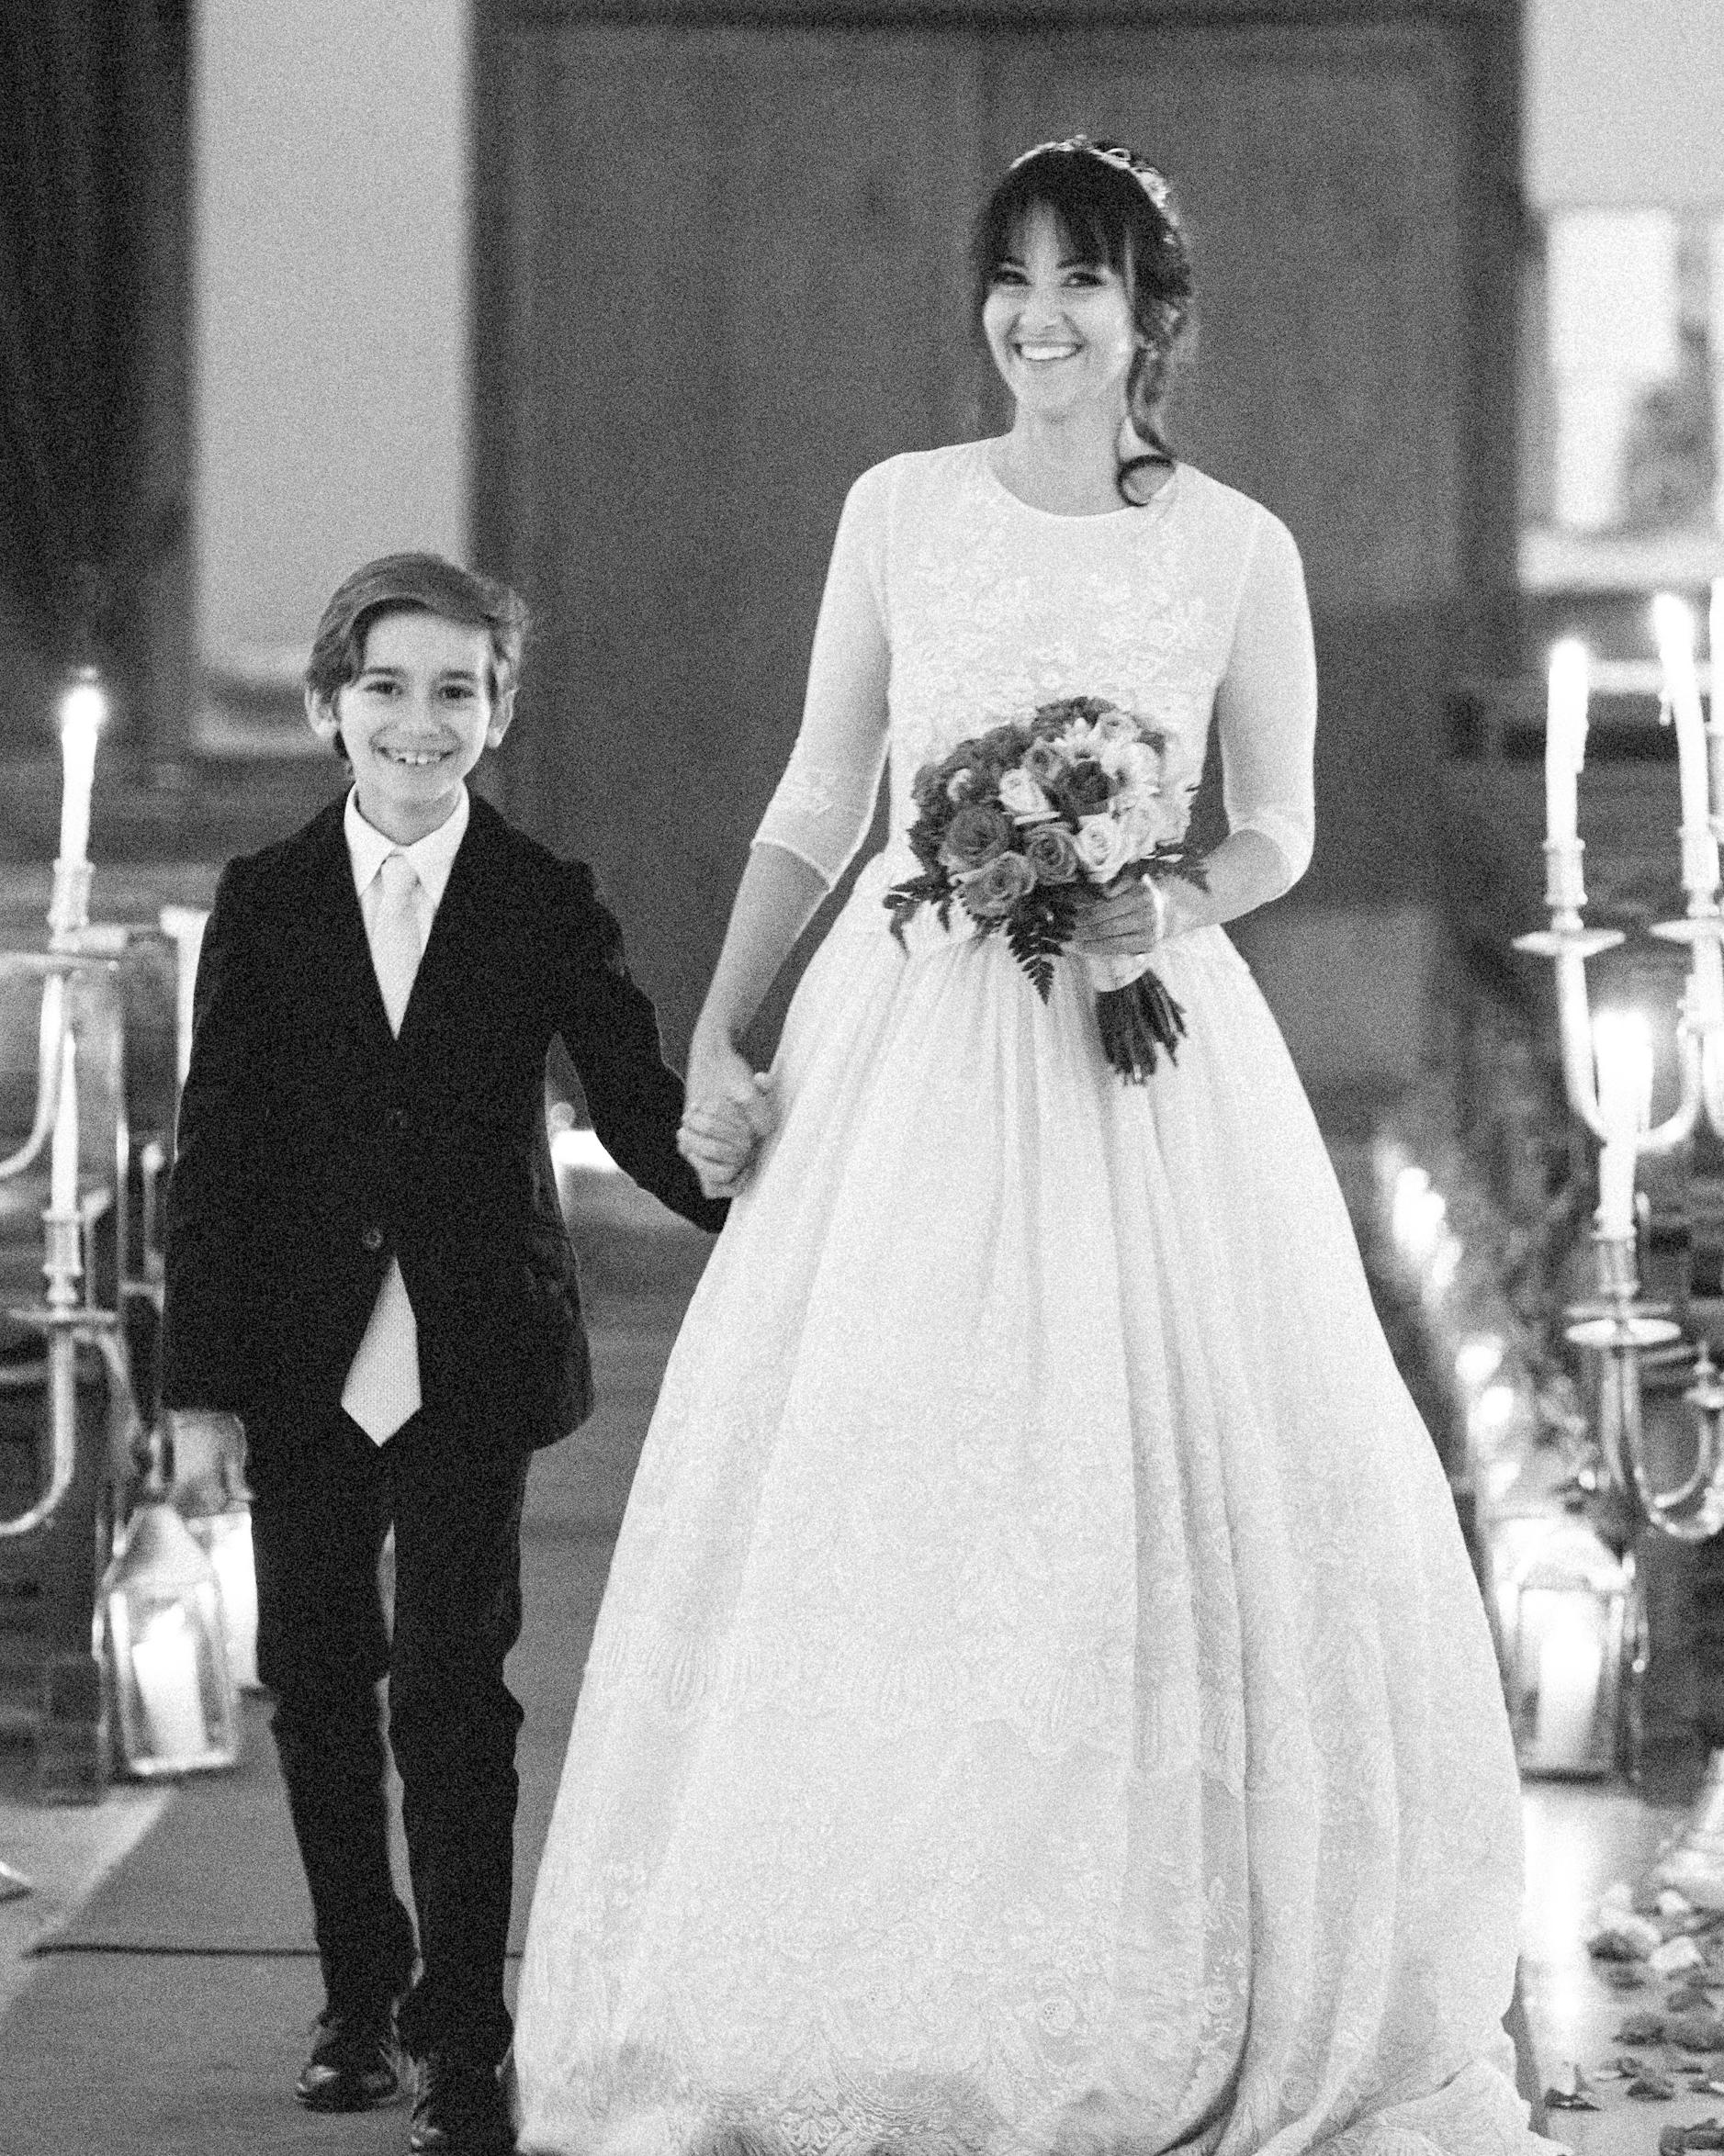 federica-tommaso-wedding-ceremony-067-s112330-1015.jpg